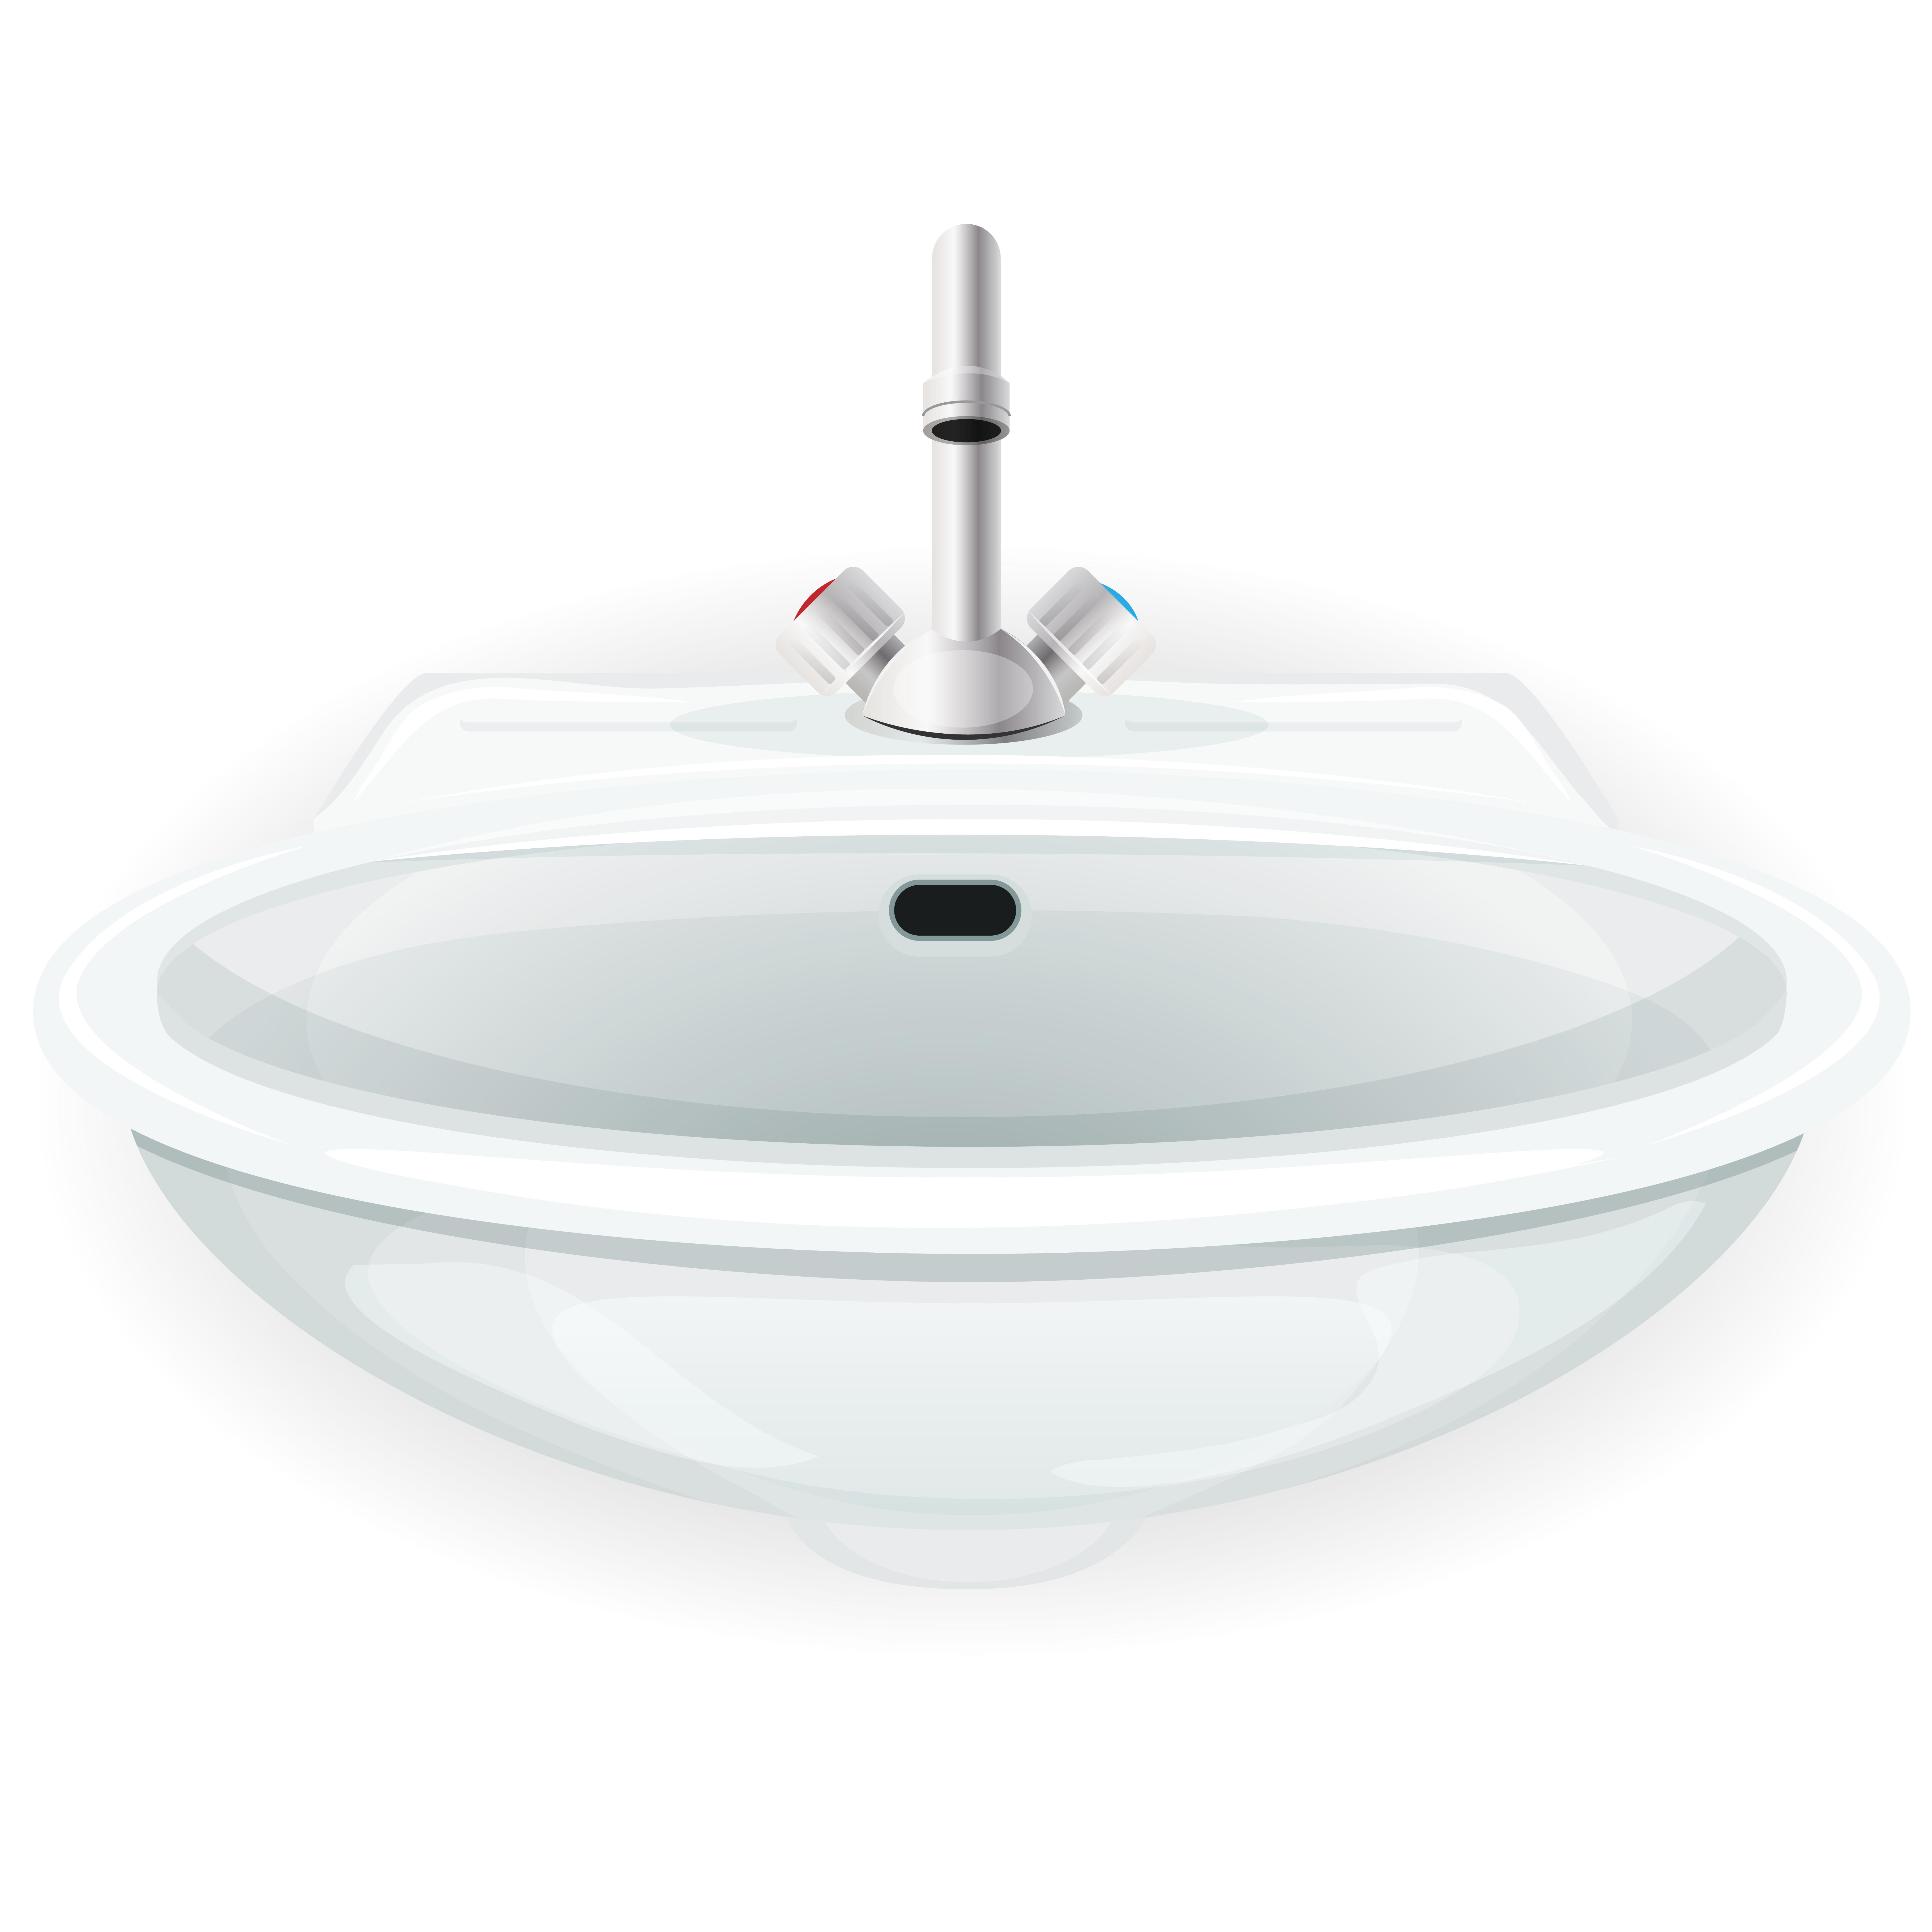 Bathroom Sink With Tap Download Free Vector Art Stock